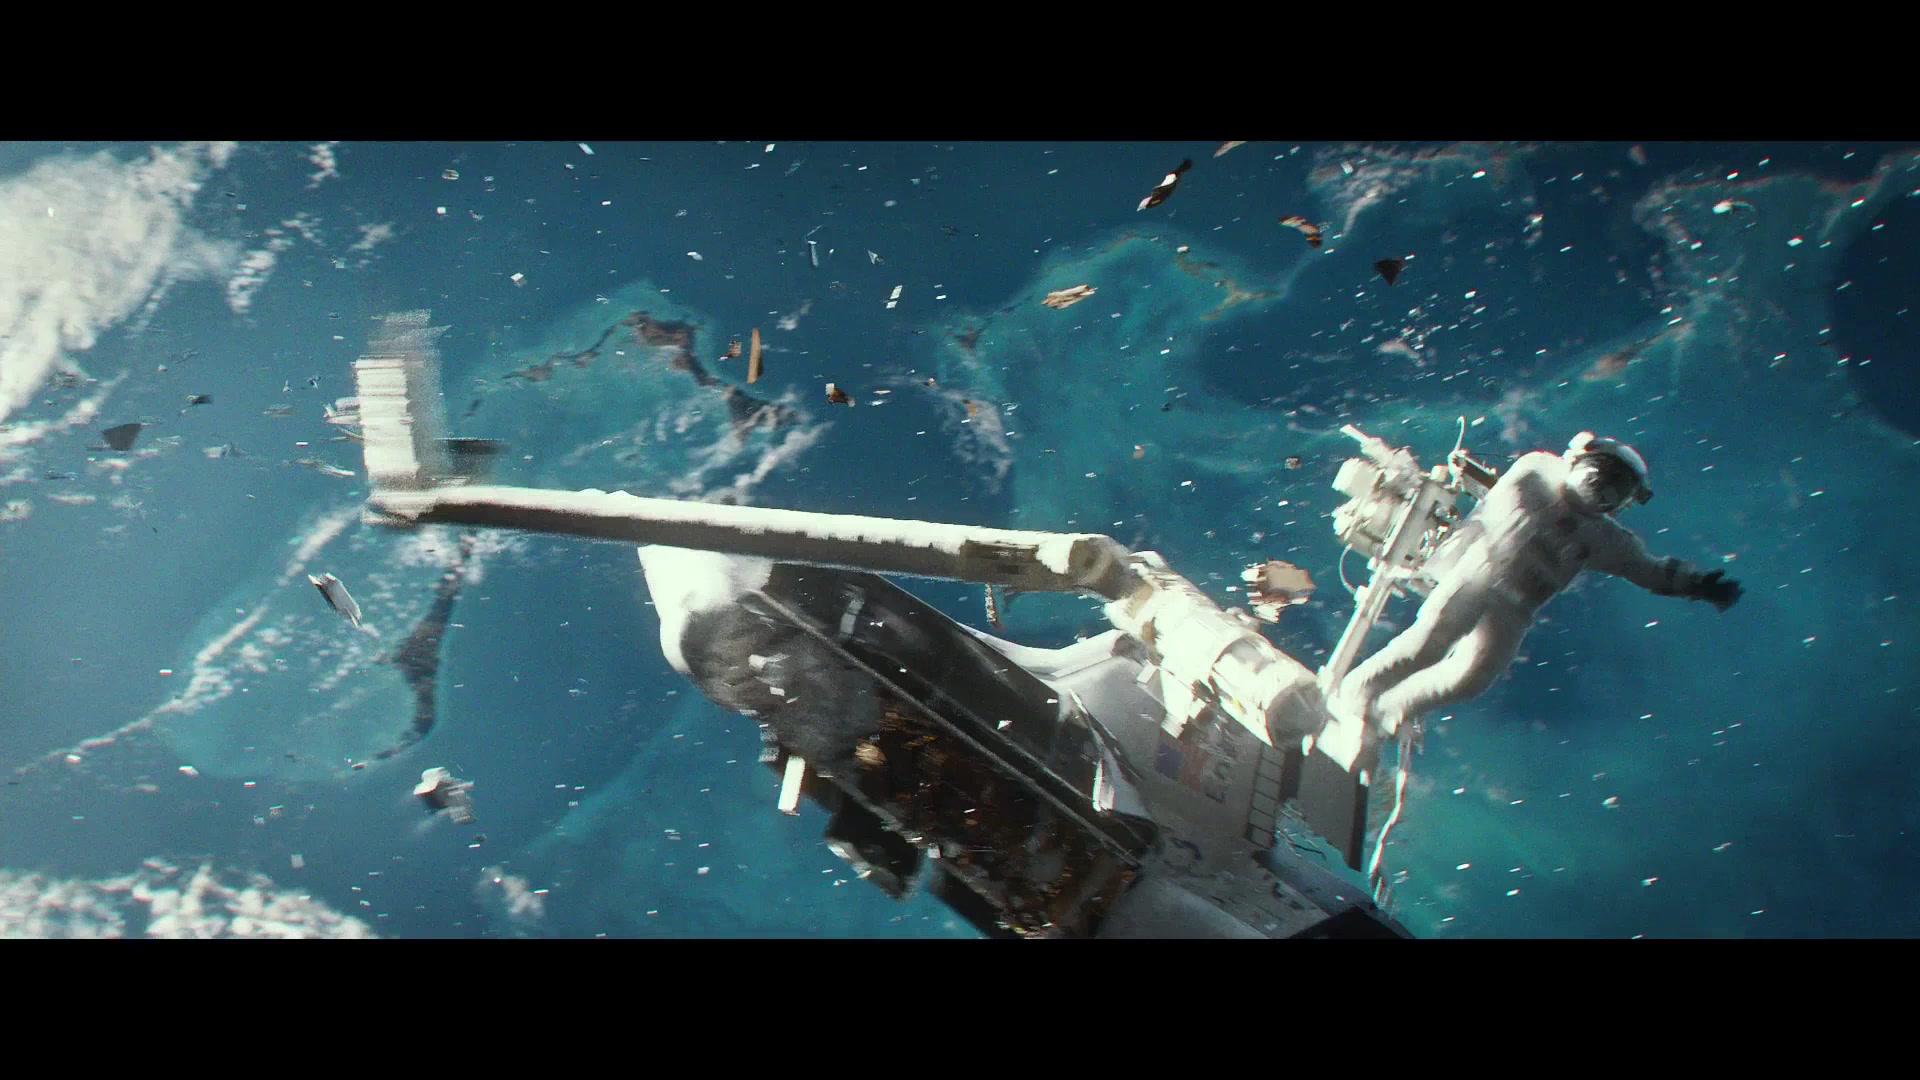 gravity (2013) - movie | moviefone